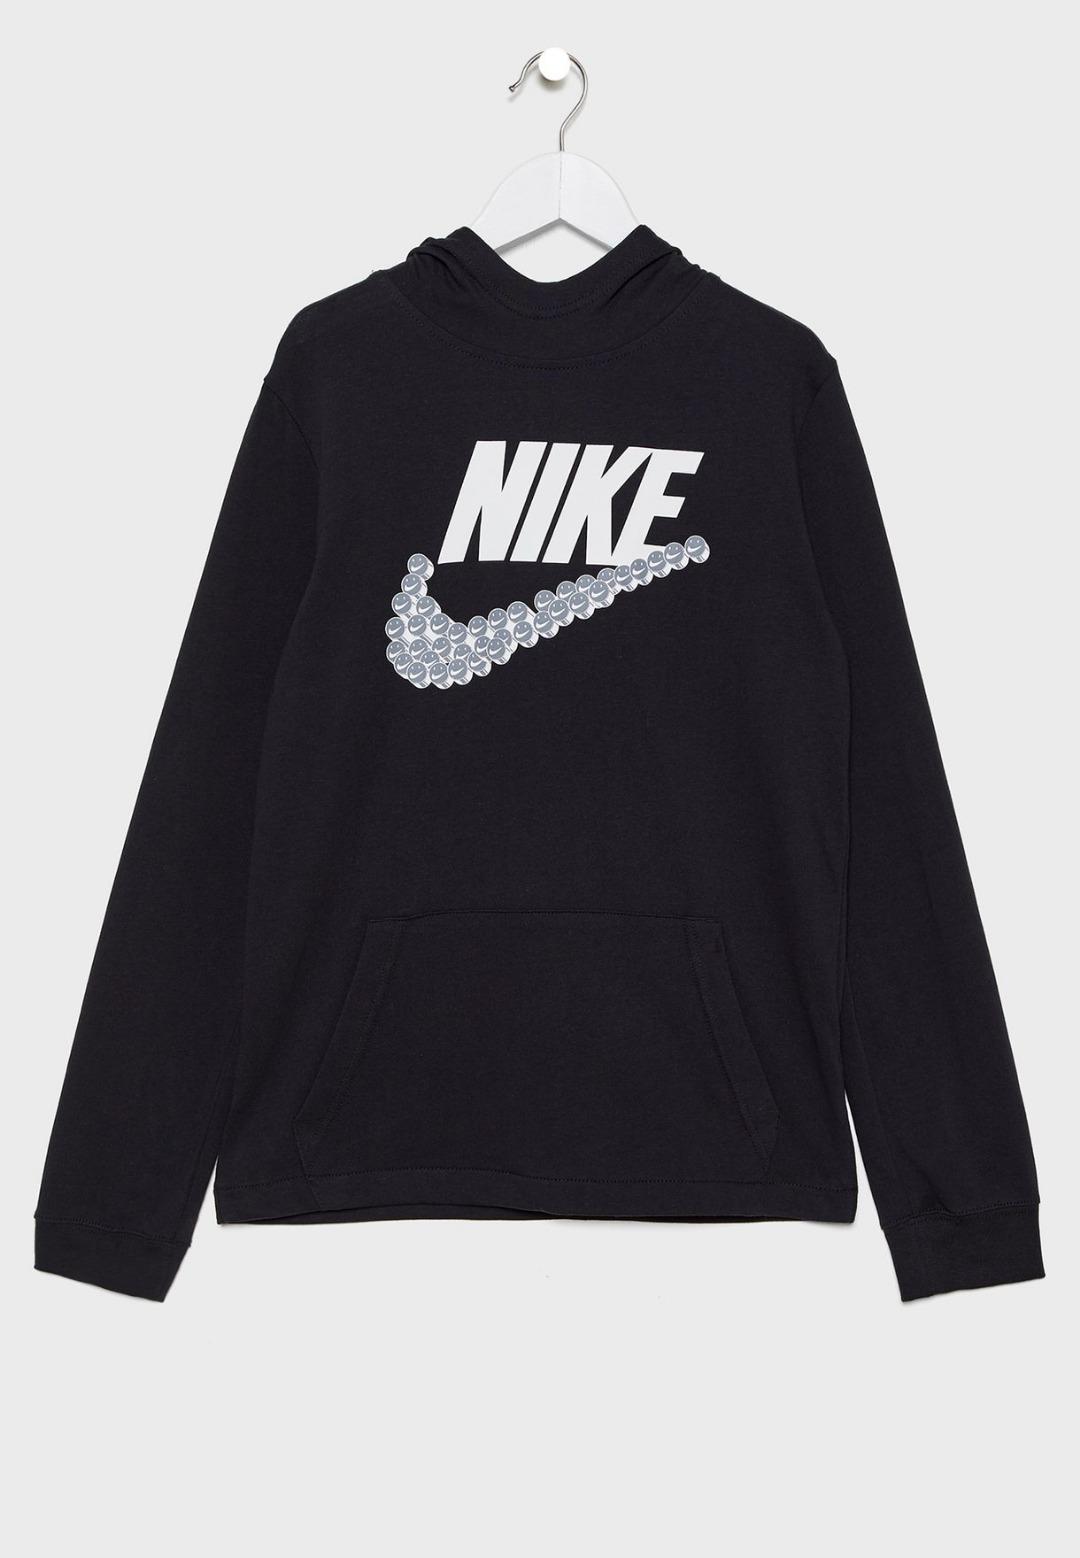 Nike Sring Smiley Swoosh Hoodie Black Bambino